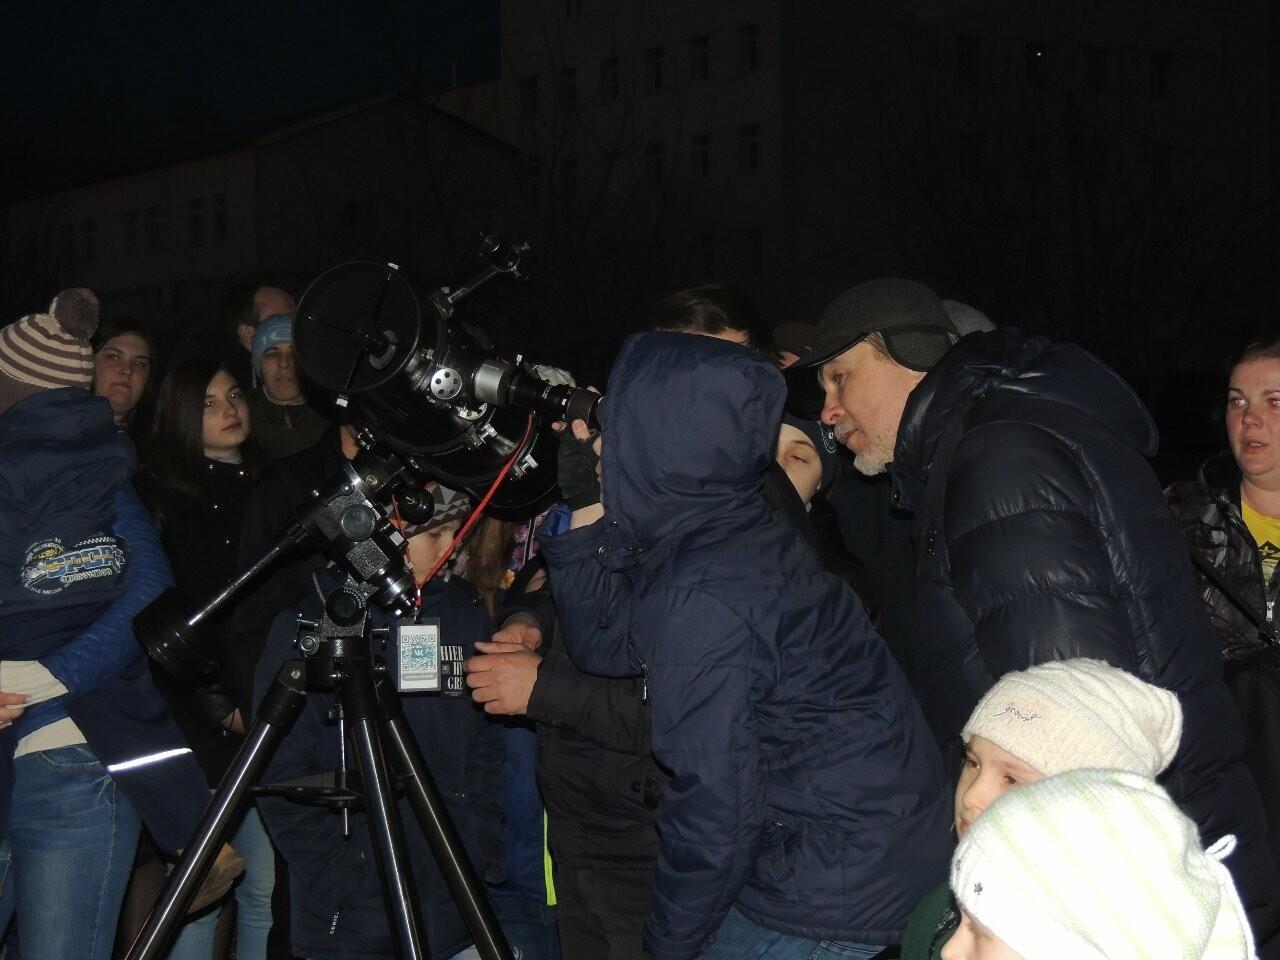 Тамбовские звездочеты получили космические подарки от Go68 и «Радио Дача», фото-2